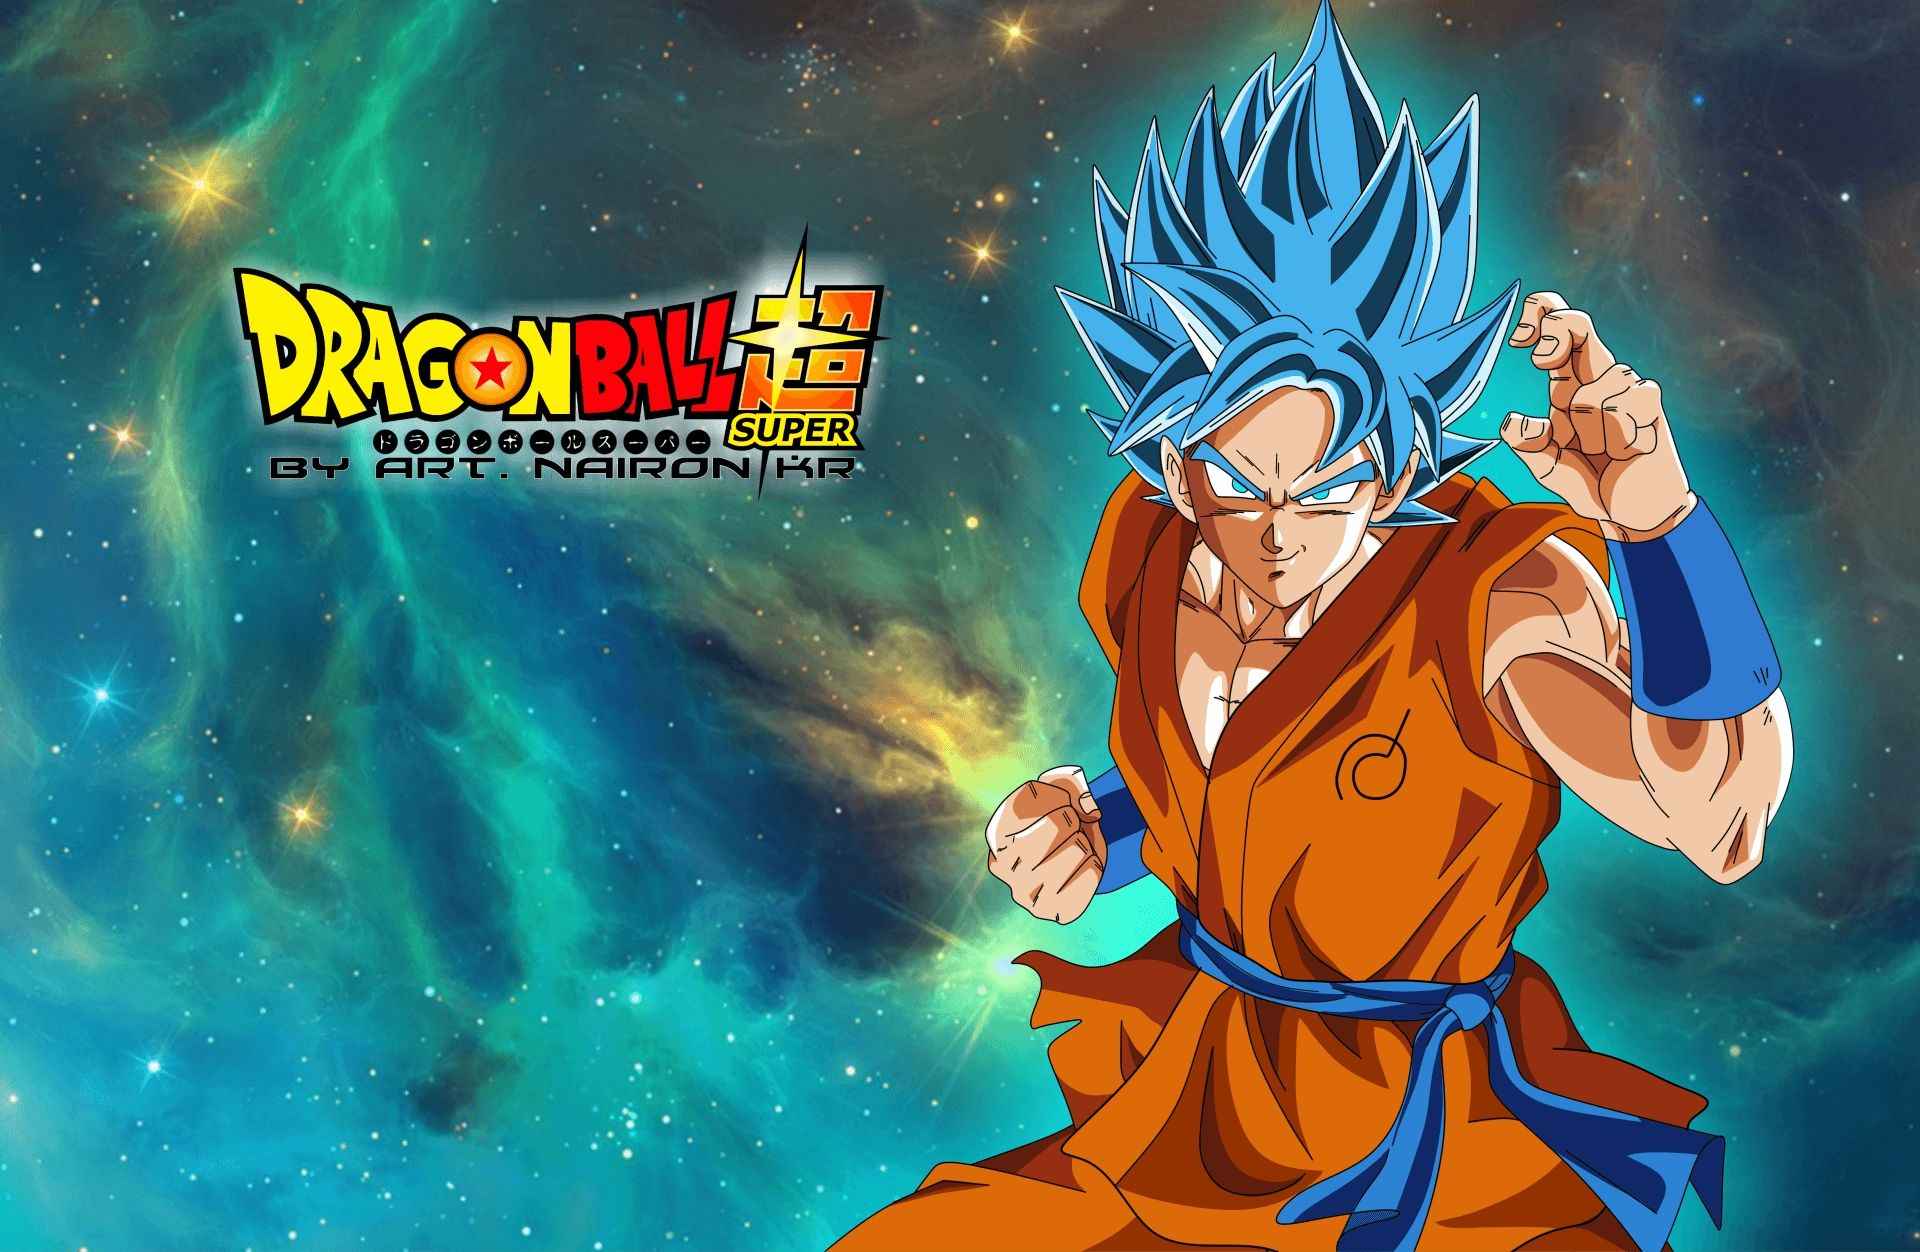 10 New Dragon Ball Super Wallpaper Full Hd 1080p For Pc Desktop Dragon Ball Super Wallpapers Hd Anime Wallpapers Goku Wallpaper